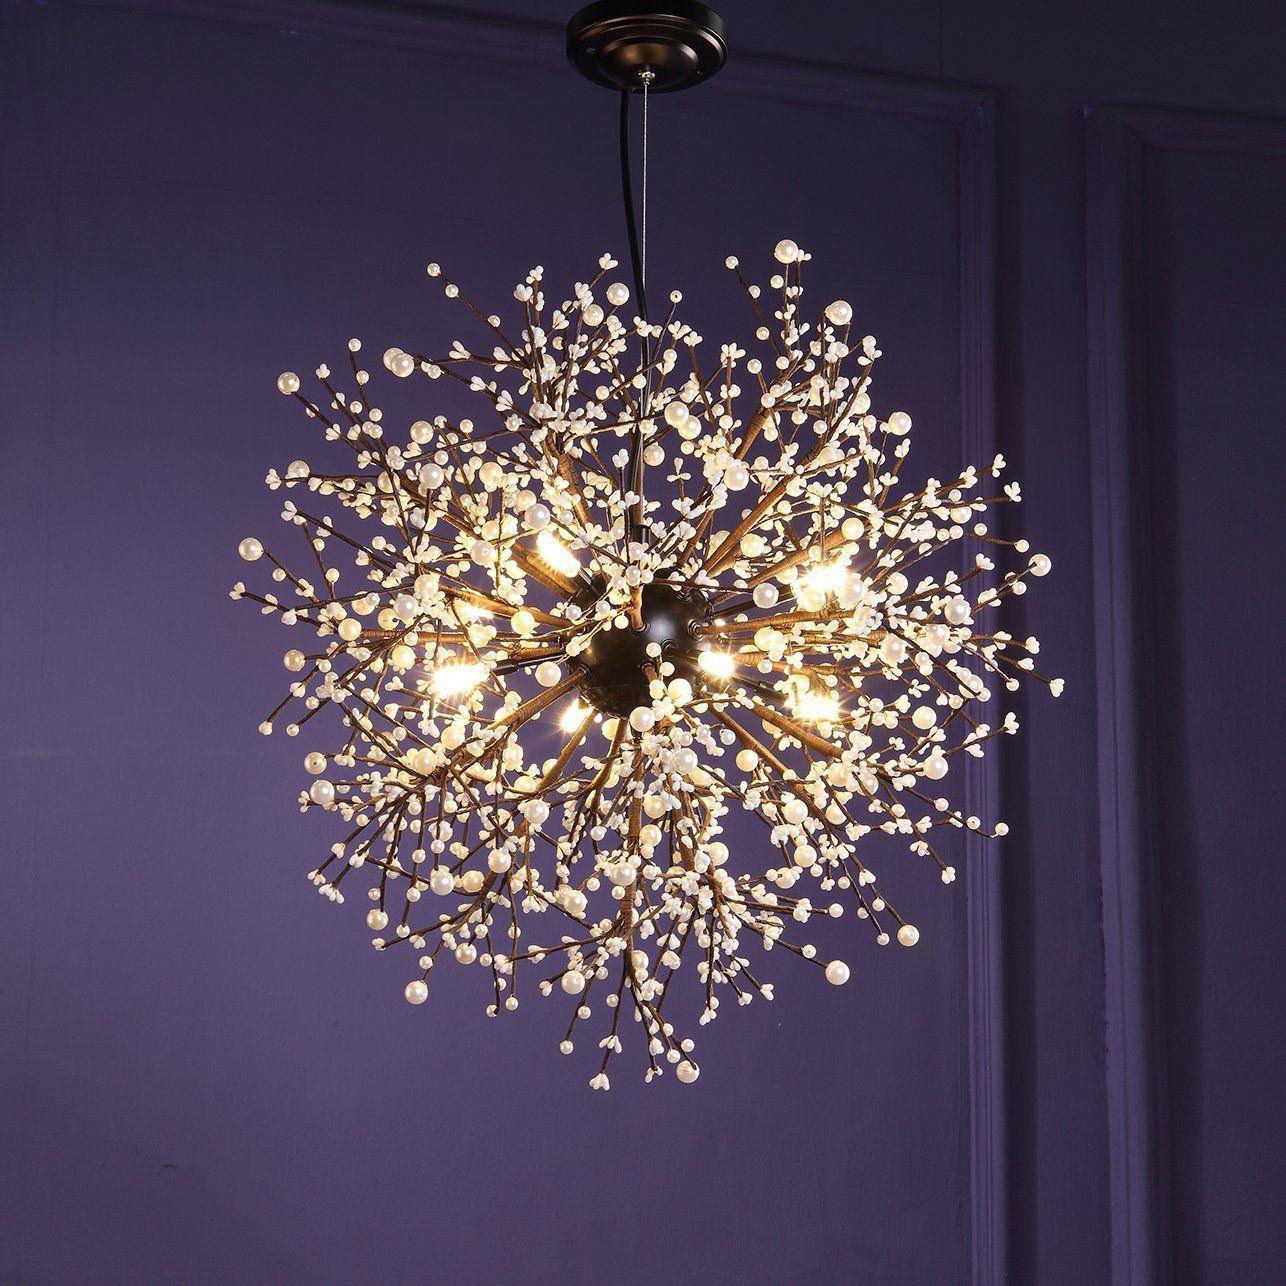 Gdns 8 Pcs Lights Chandeliers Firework Led Vintage Wrought Iron Chandelier Island Pendant Lighting Ceiling Light